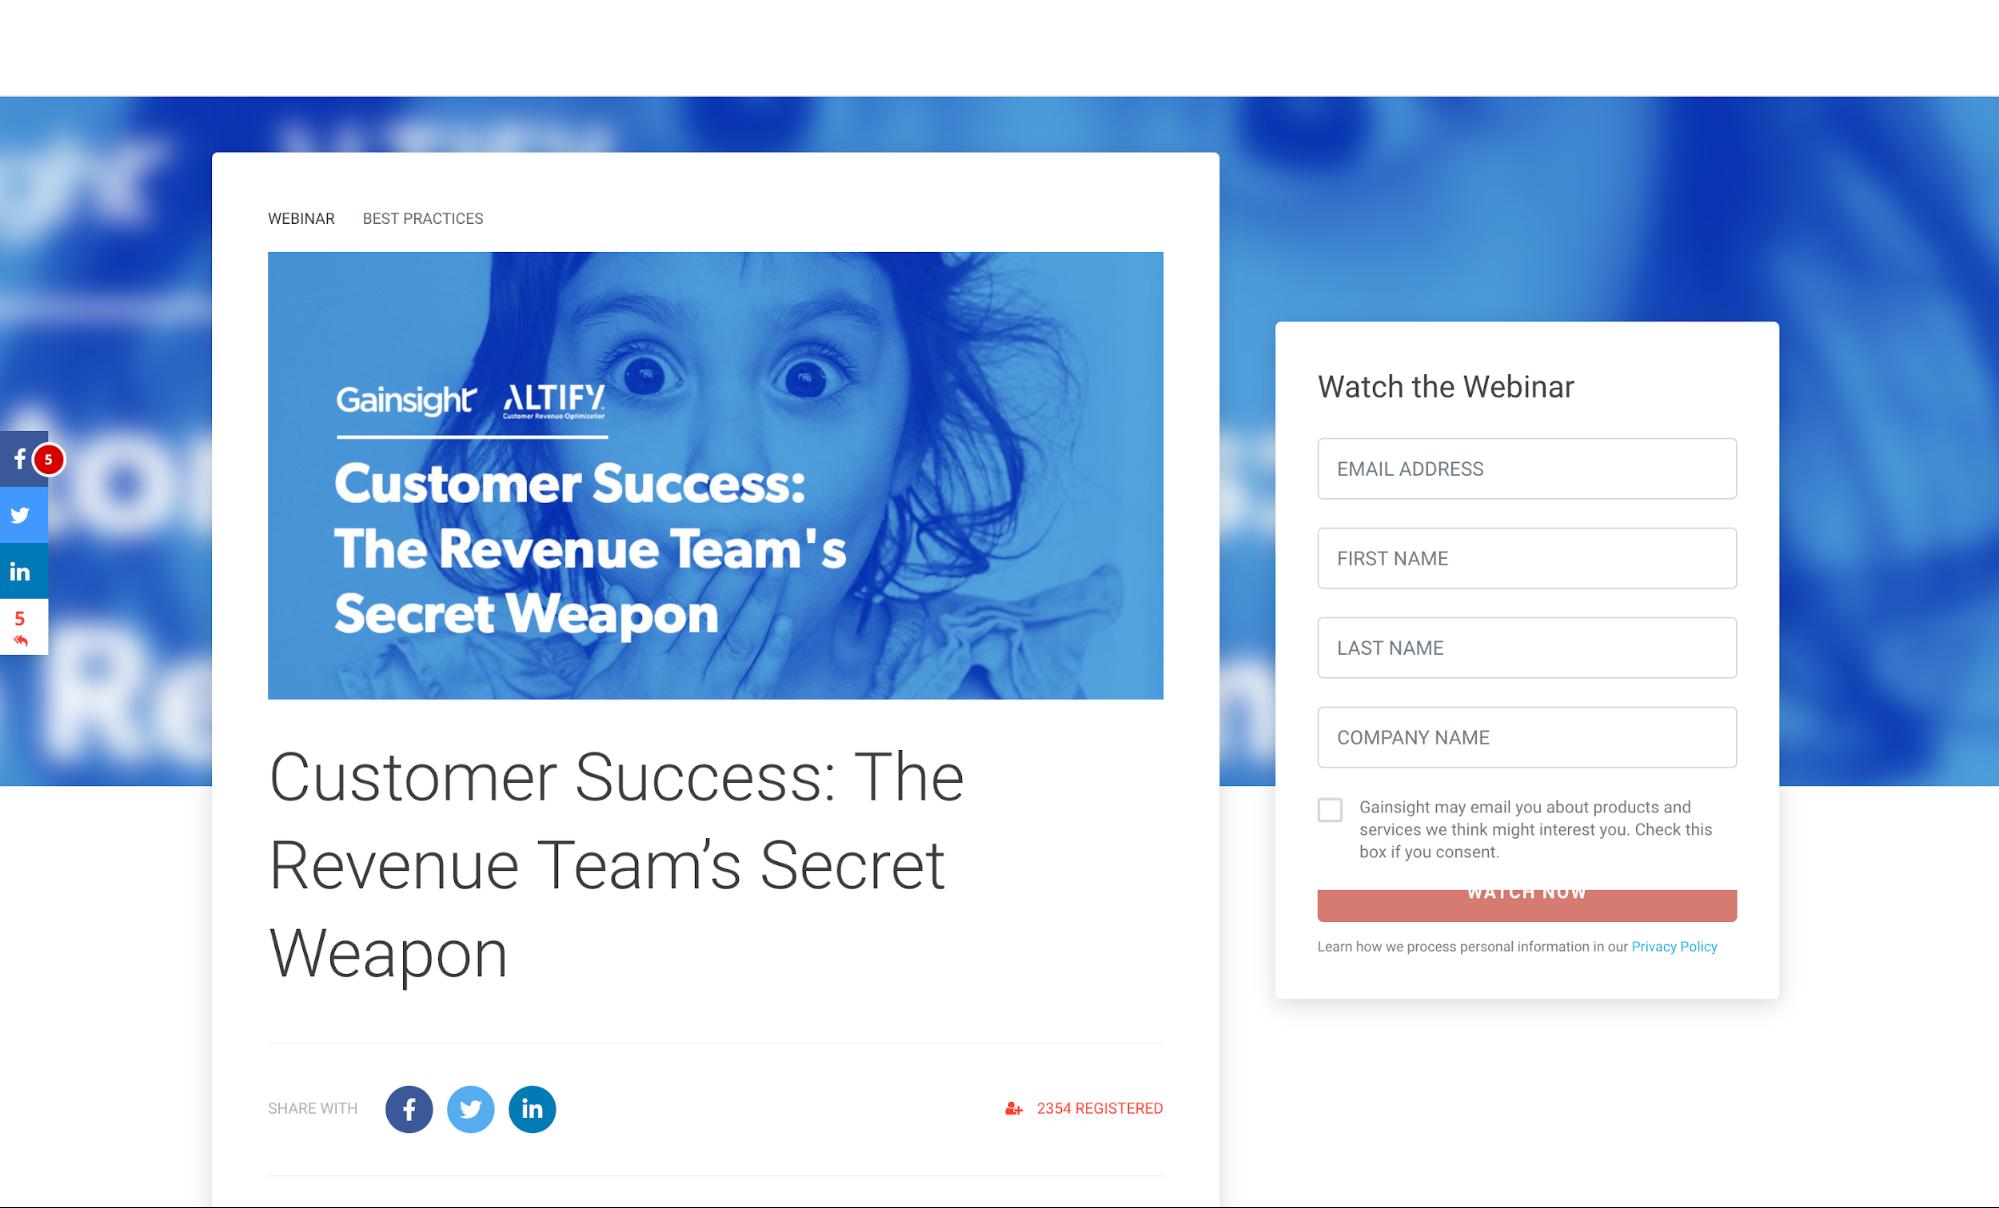 co-marketing webinar